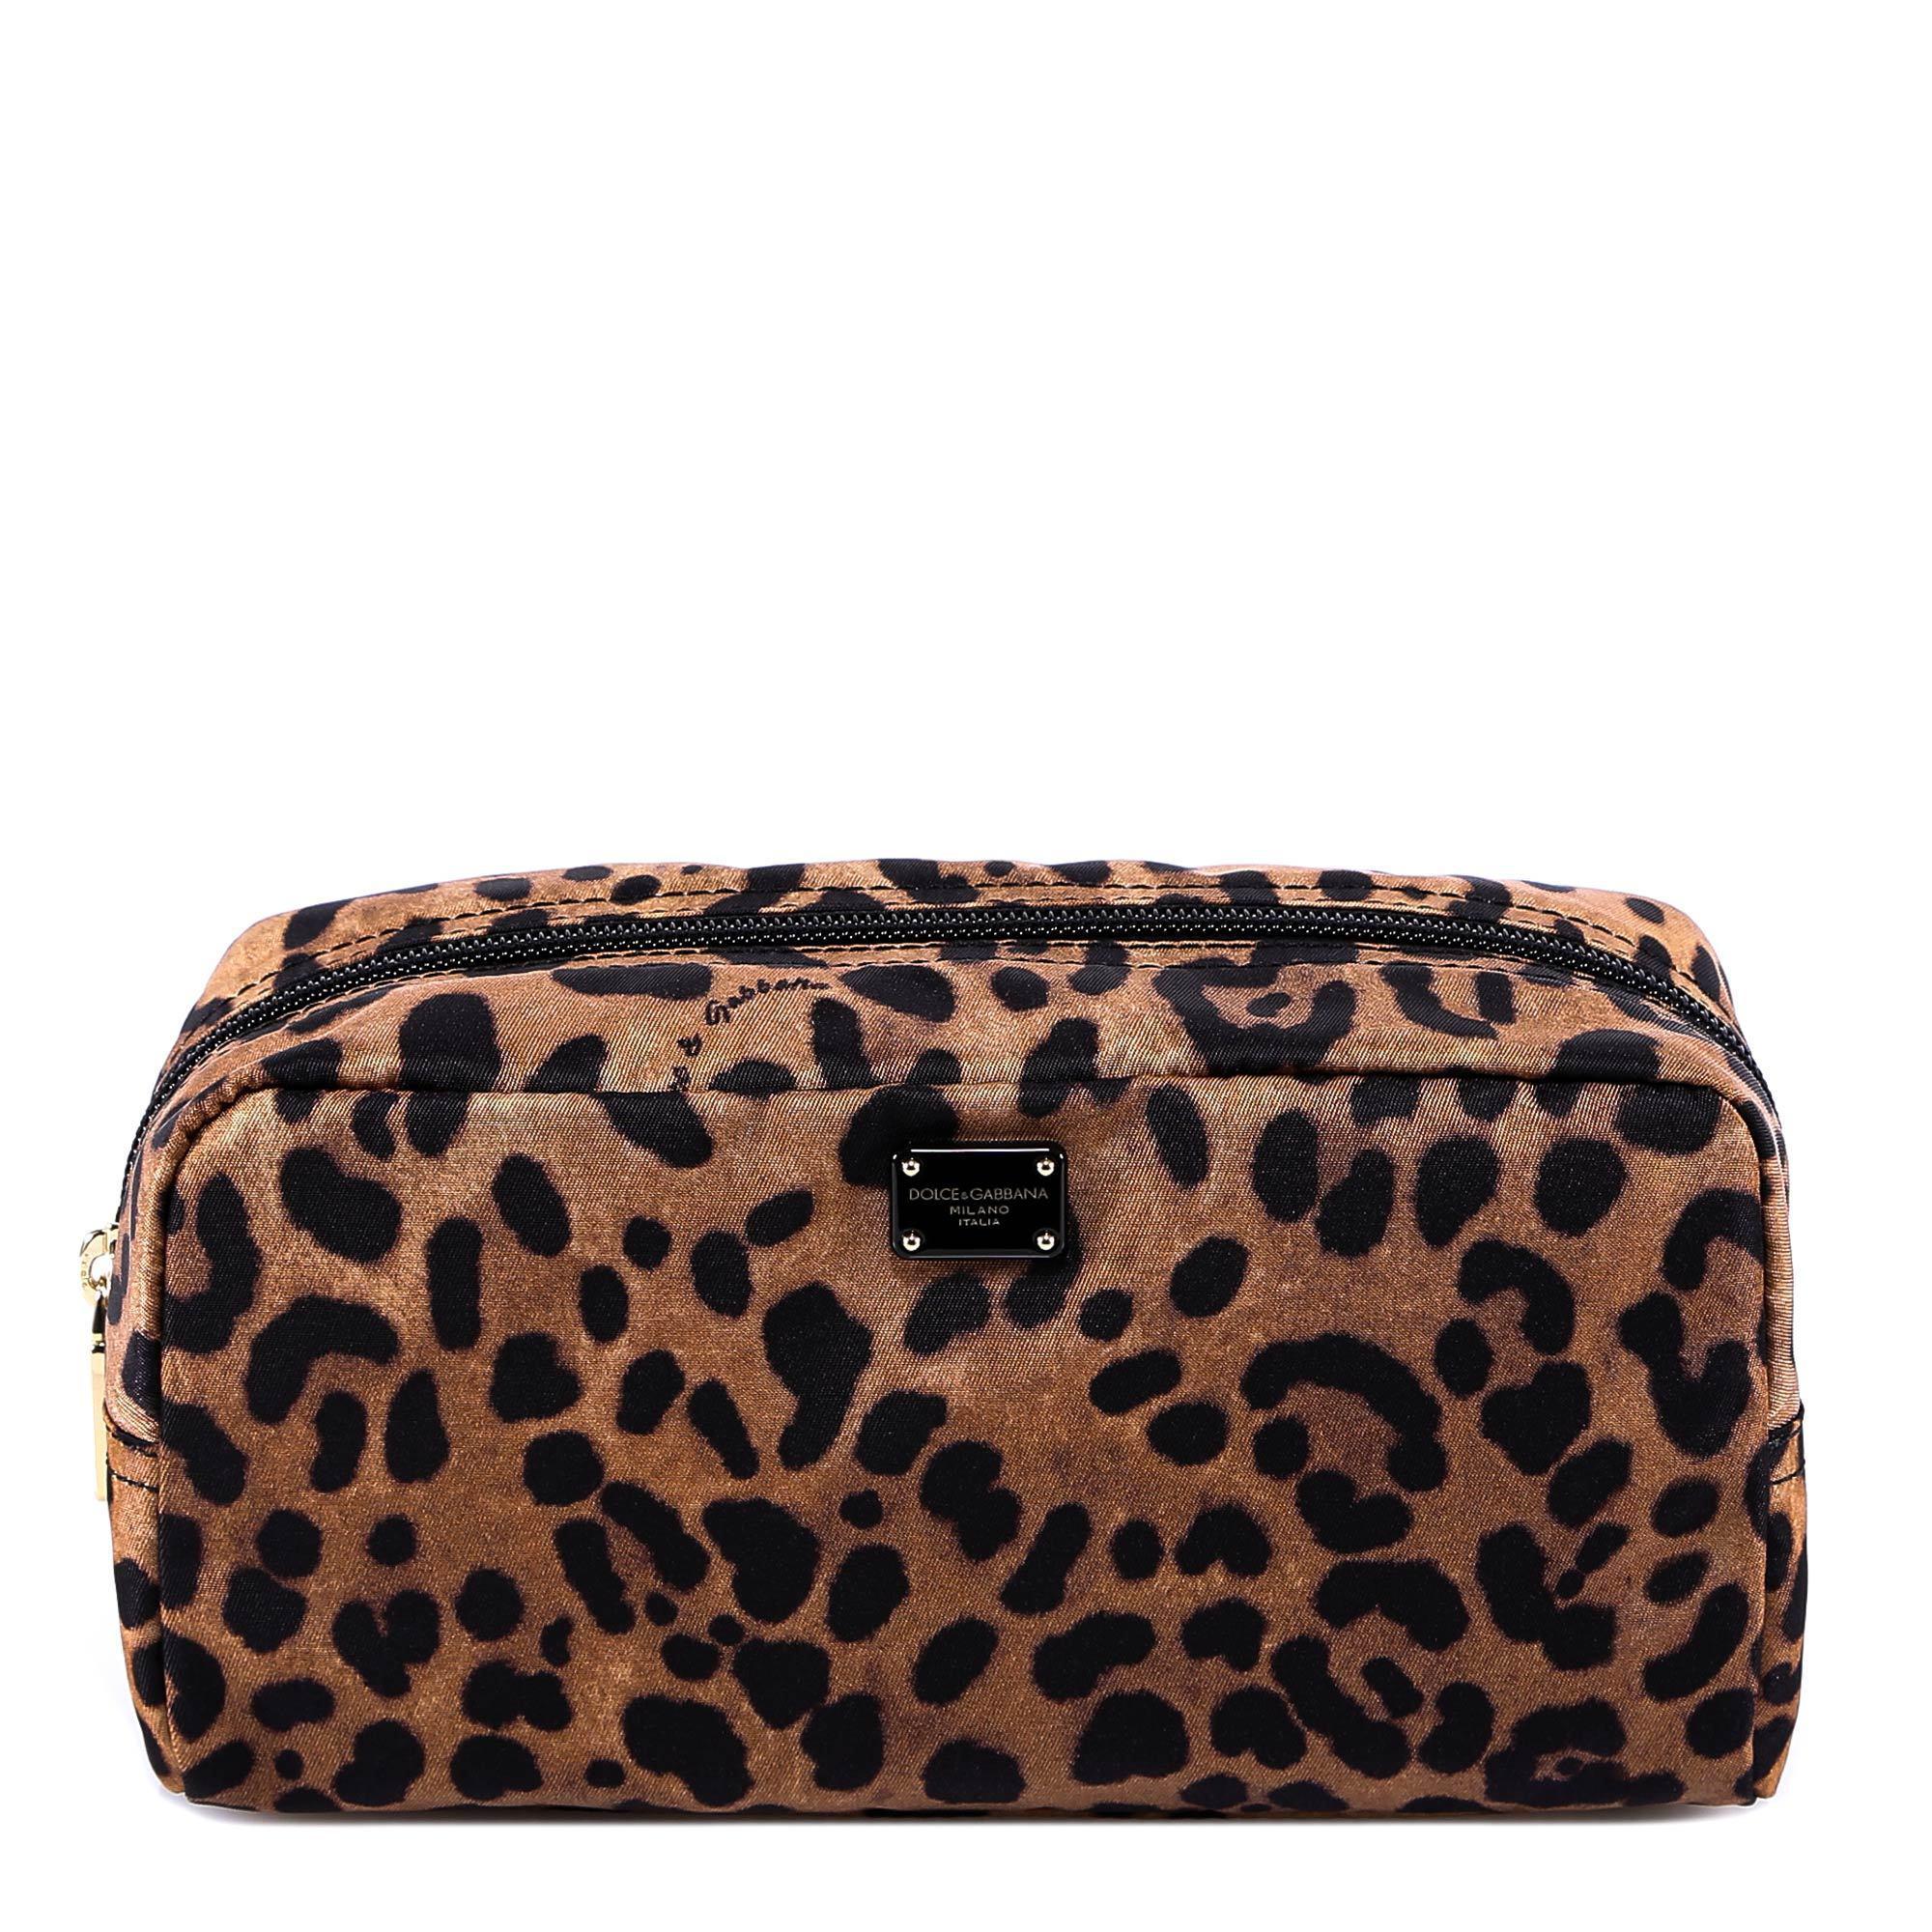 65dc99cf0f6c Dolce   Gabbana Leopard Print Make-up Bag in Brown - Lyst